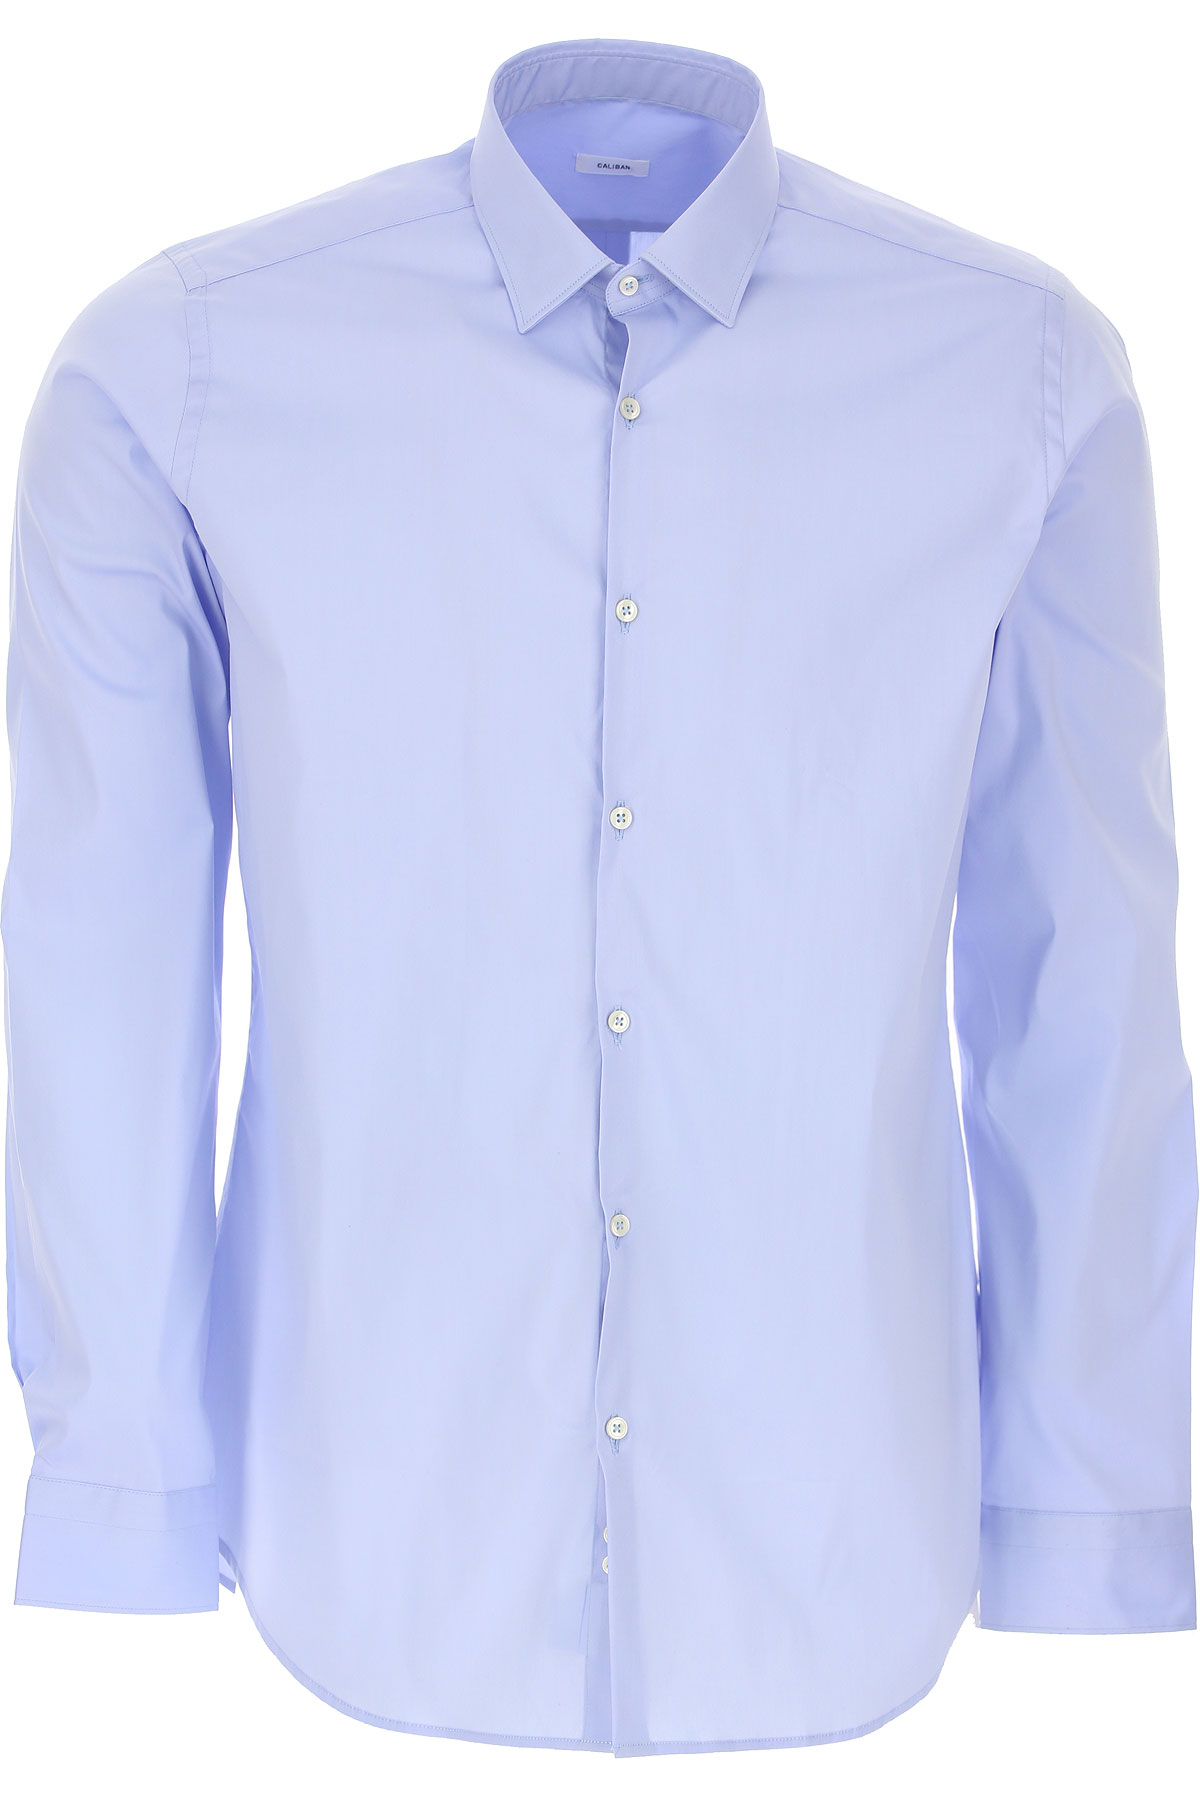 Caliban Shirt for Men On Sale, Azure, Cotton, 2019, 15 15.5 15.75 16 16.5 17 17.5